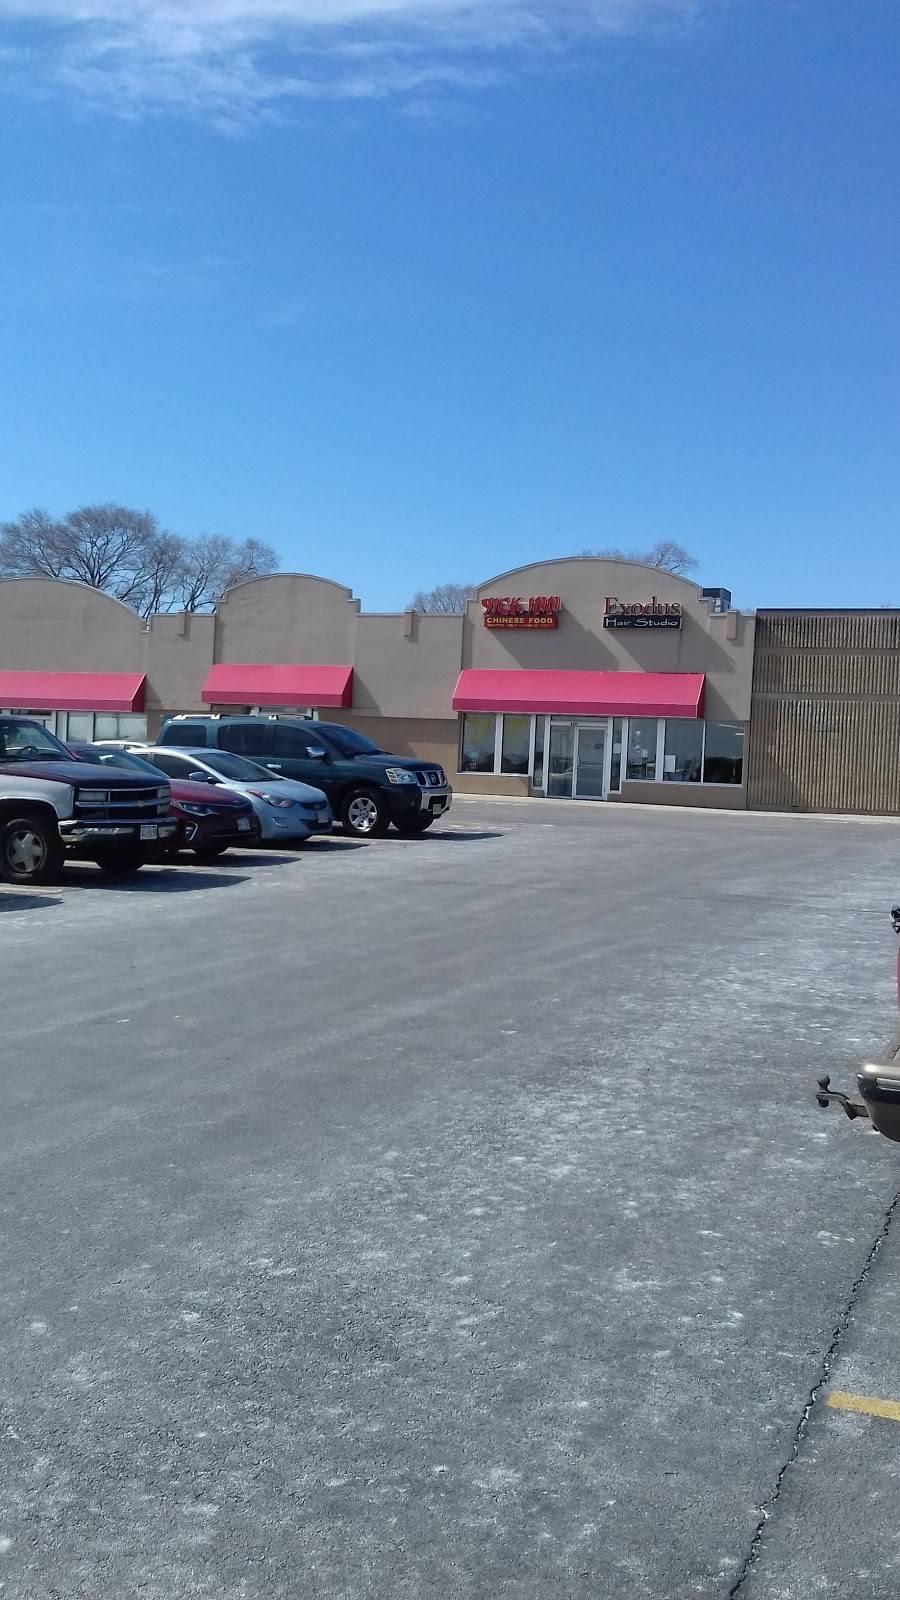 Yick Inn   restaurant   6107 N Teutonia Ave, Milwaukee, WI 53209, USA   4144612240 OR +1 414-461-2240